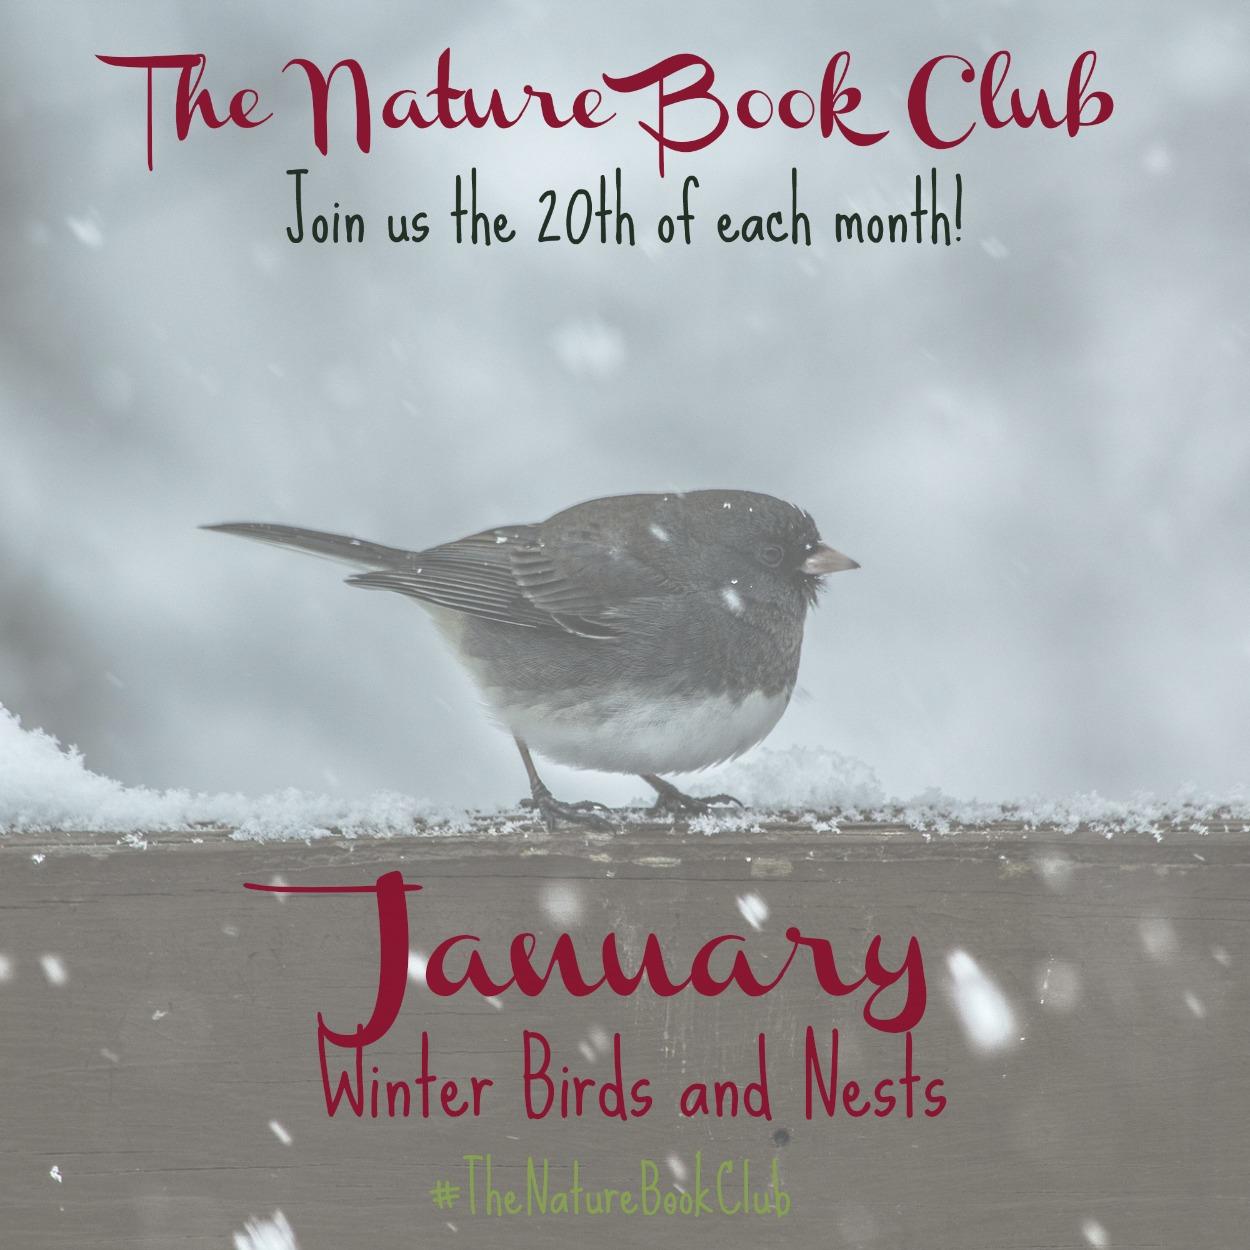 Winter Birds And Nests Scavenger Hunt Naturebookclub